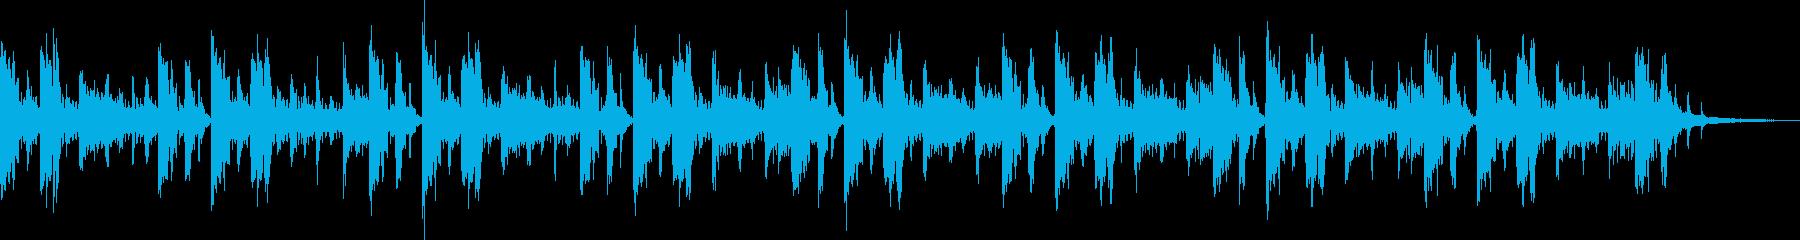 STGプレイ風コミカル15秒の再生済みの波形